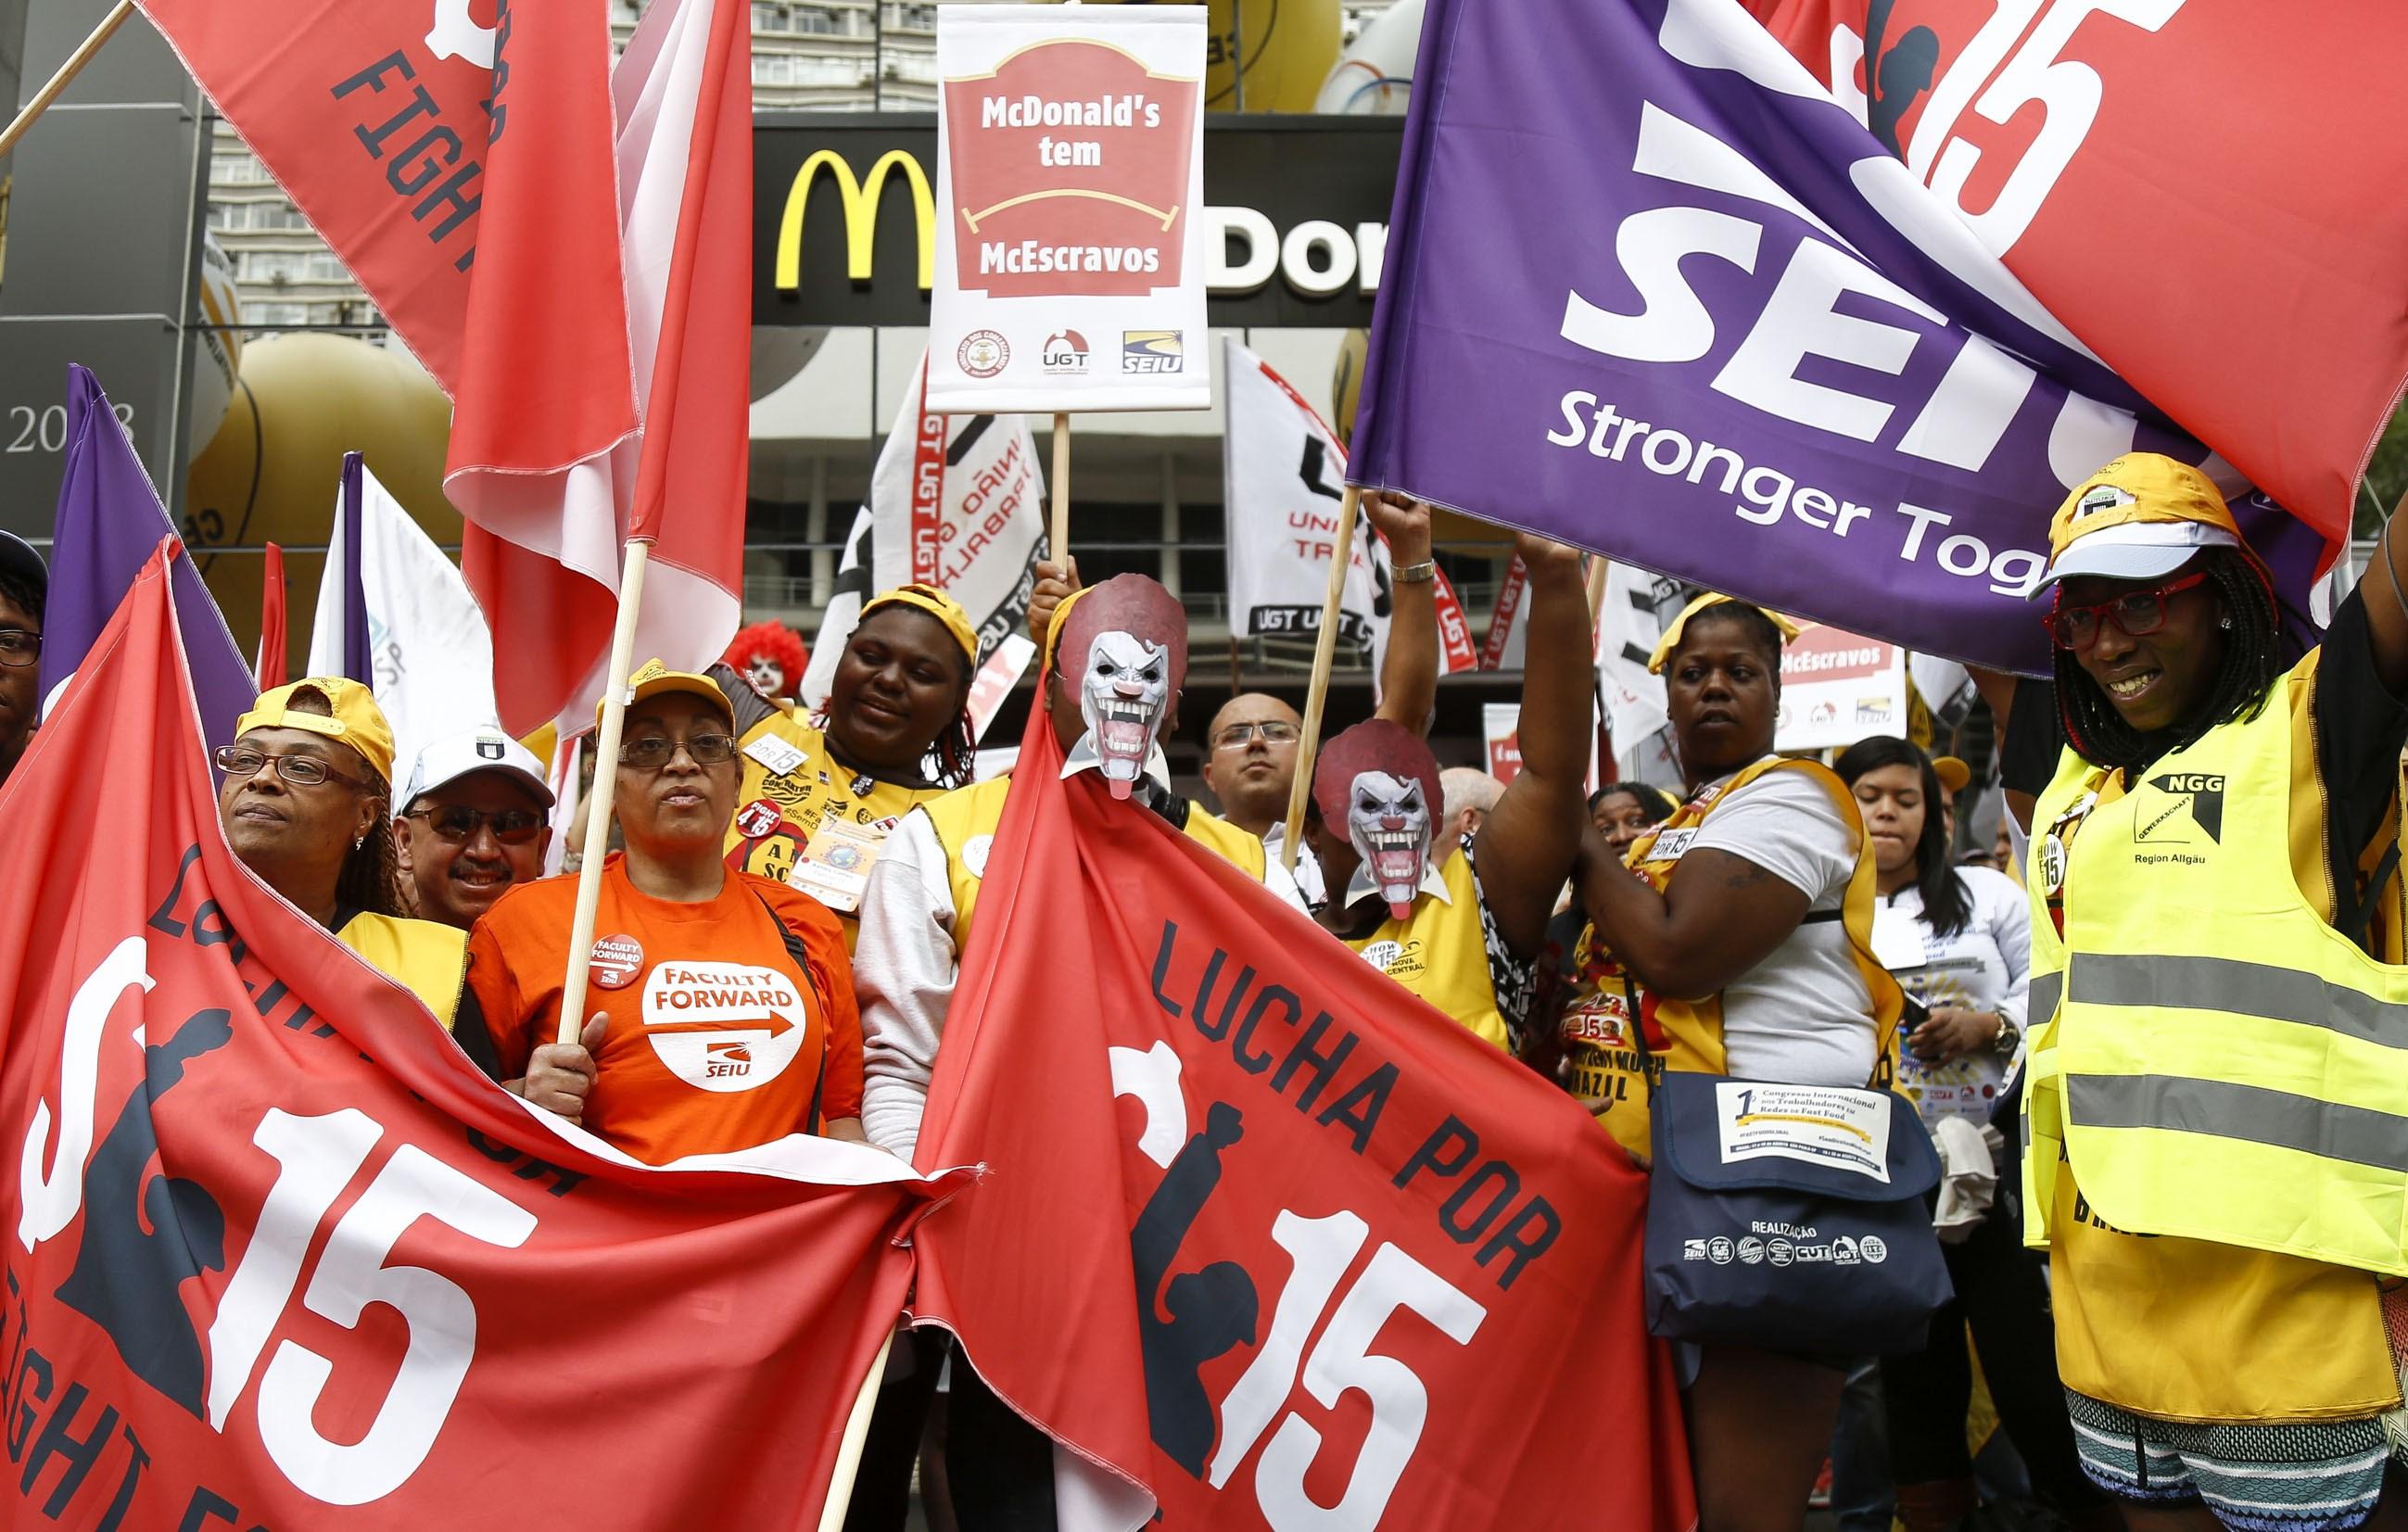 BRAZIL-MCDONALDS-PROTEST